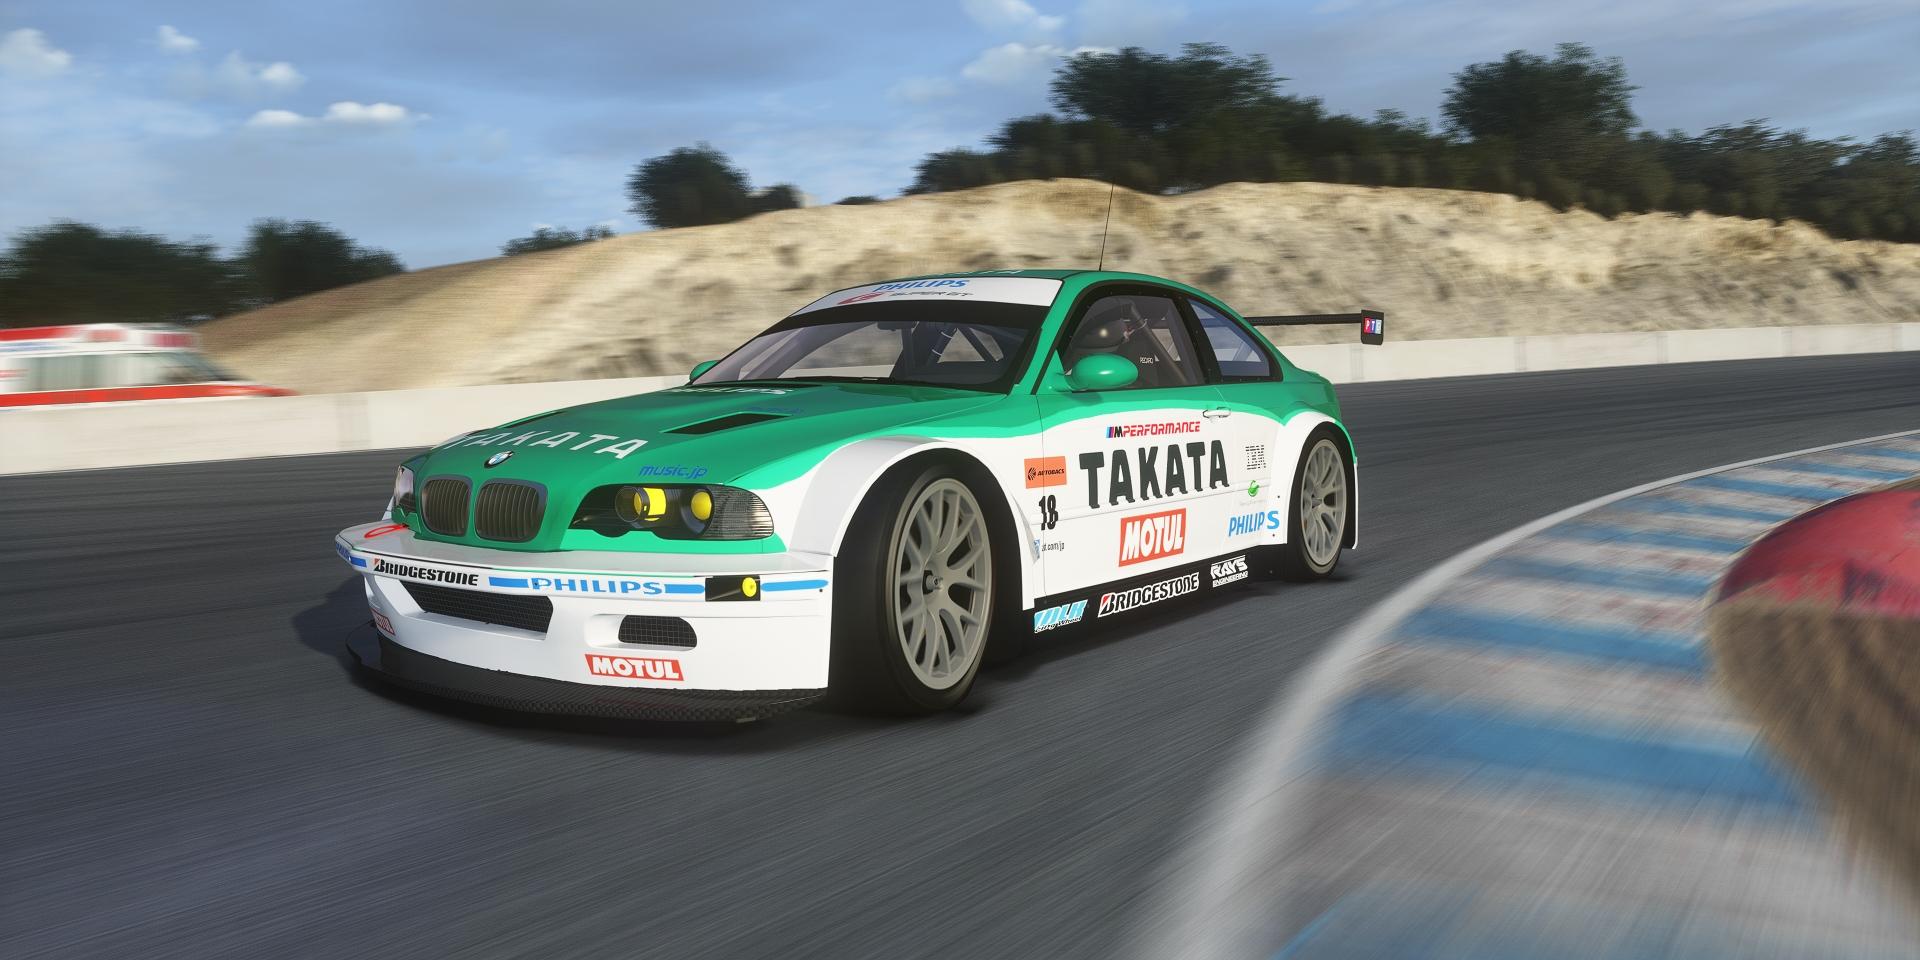 Bmw M3 E46 Gtr Gt2 Takata Skin Racedepartment